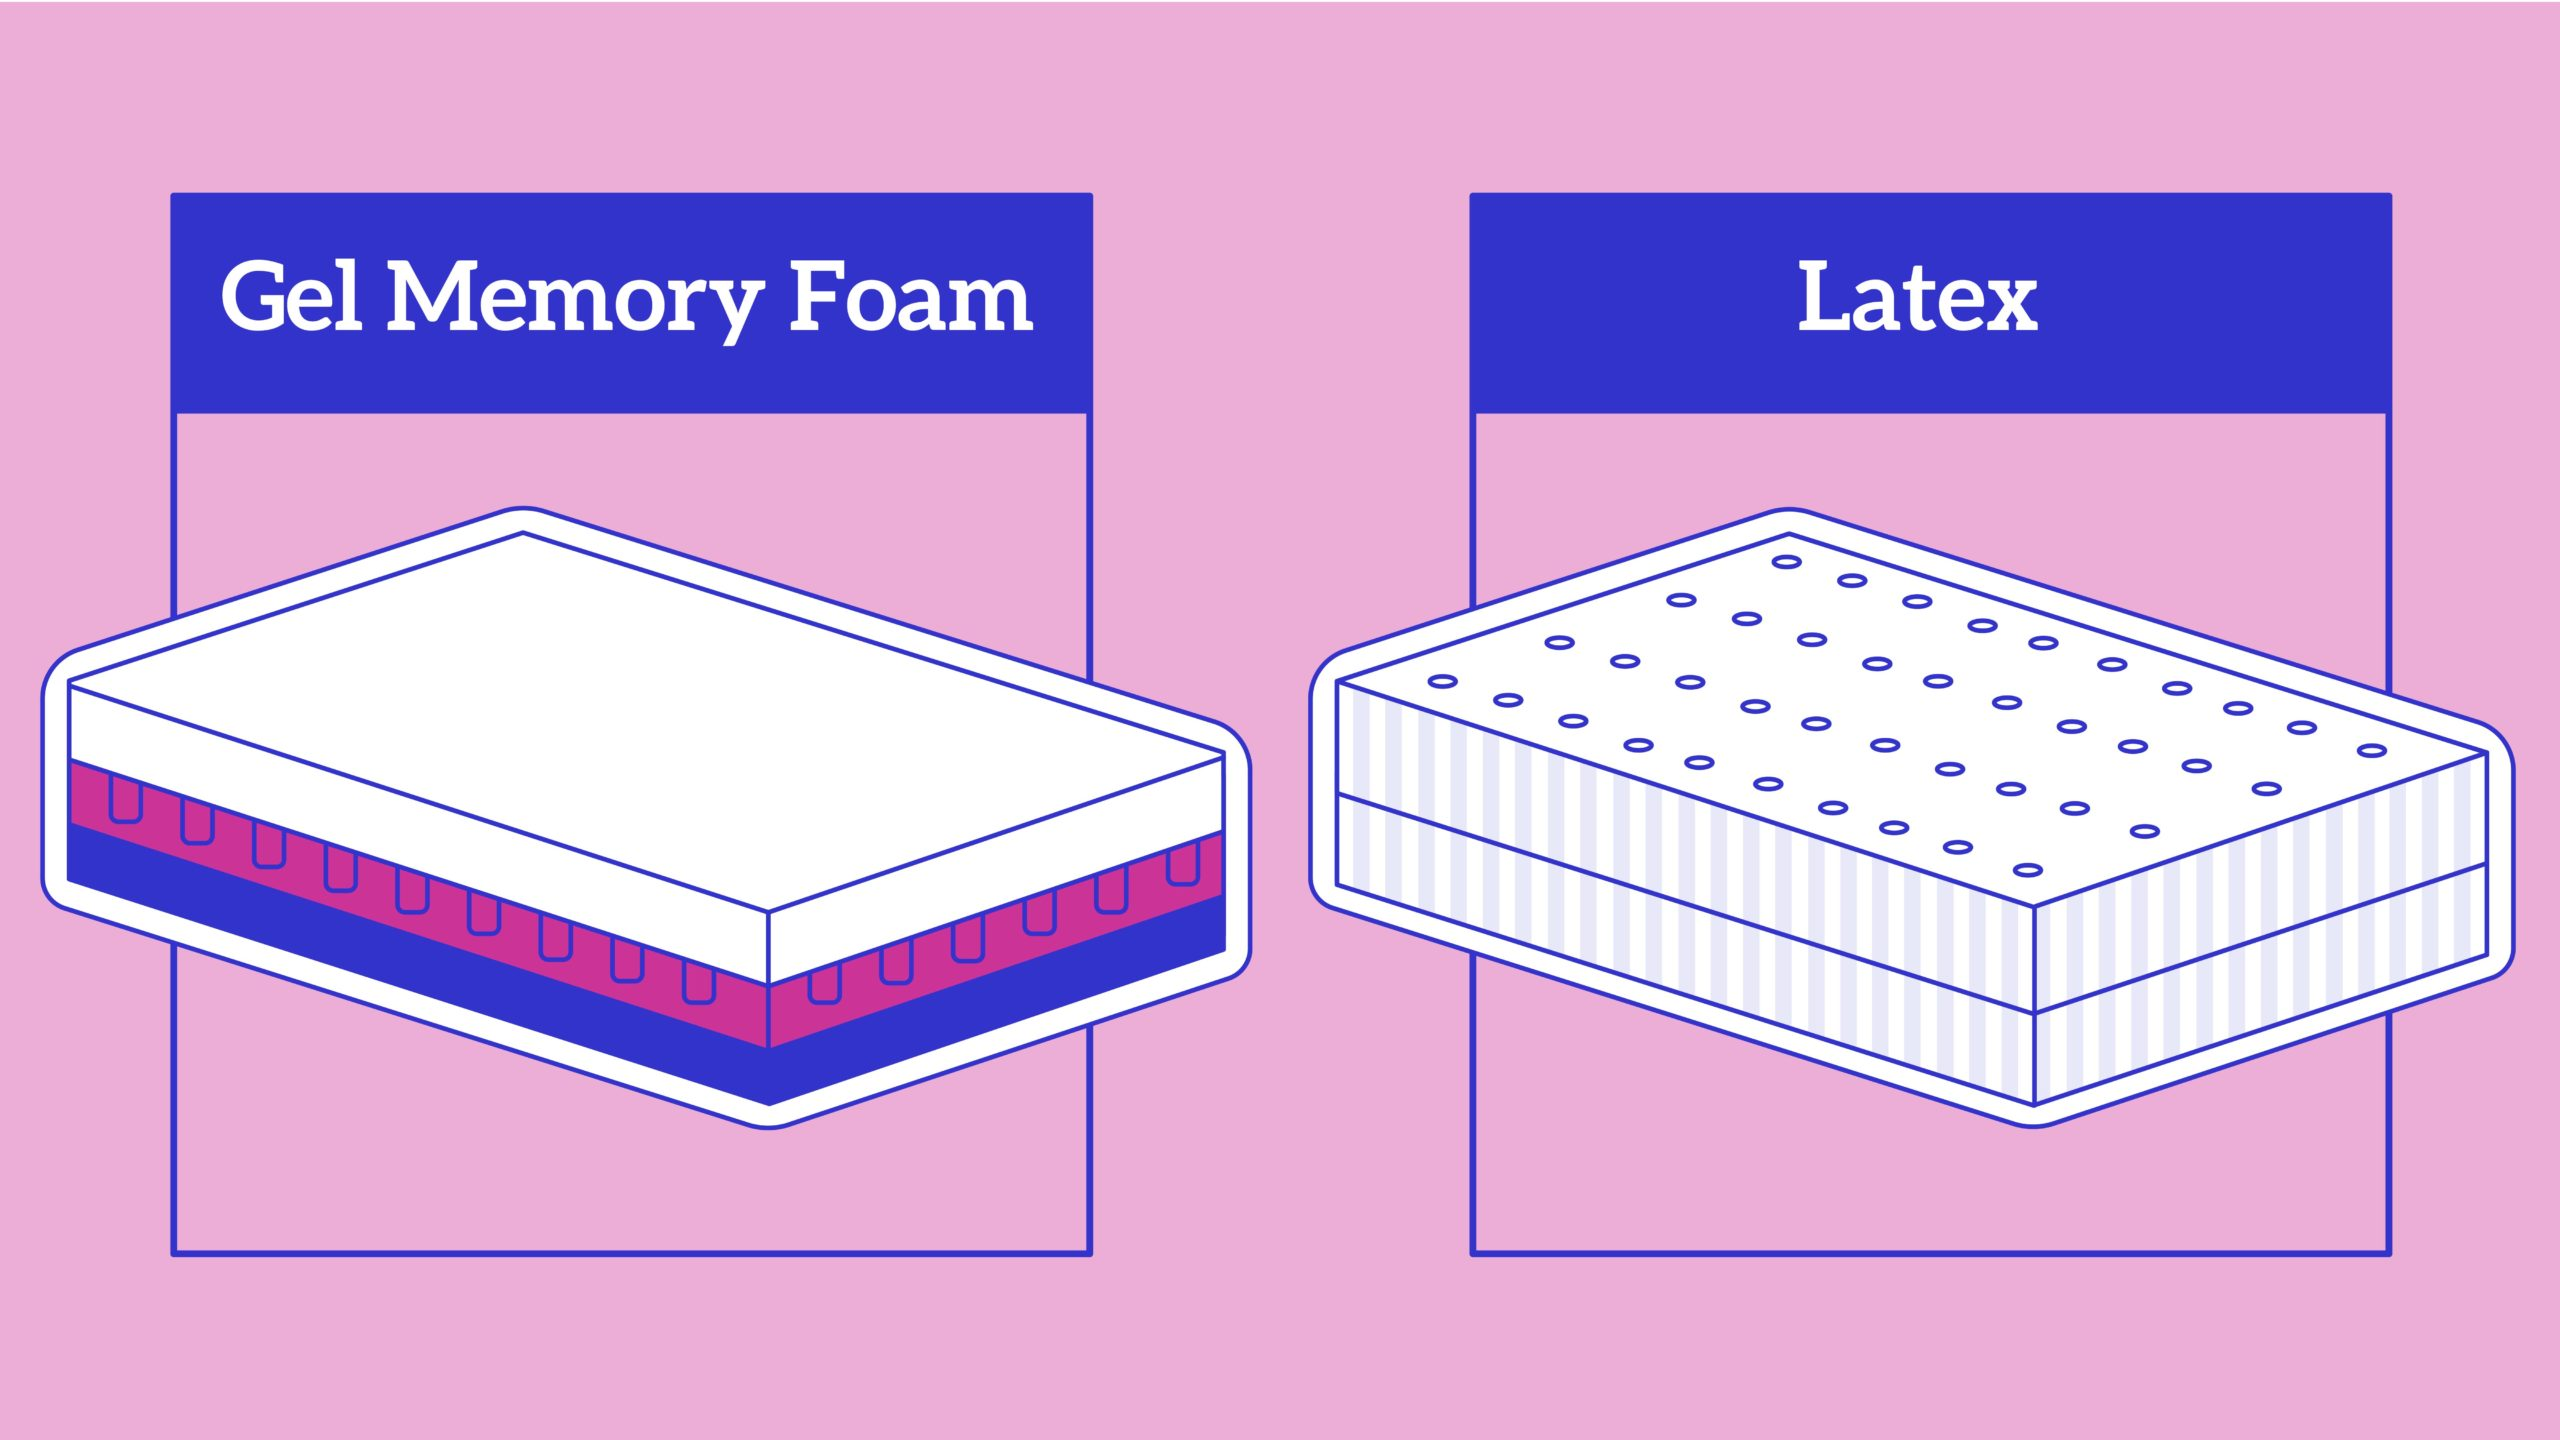 Gel-Memory-Foam-vs-Latex